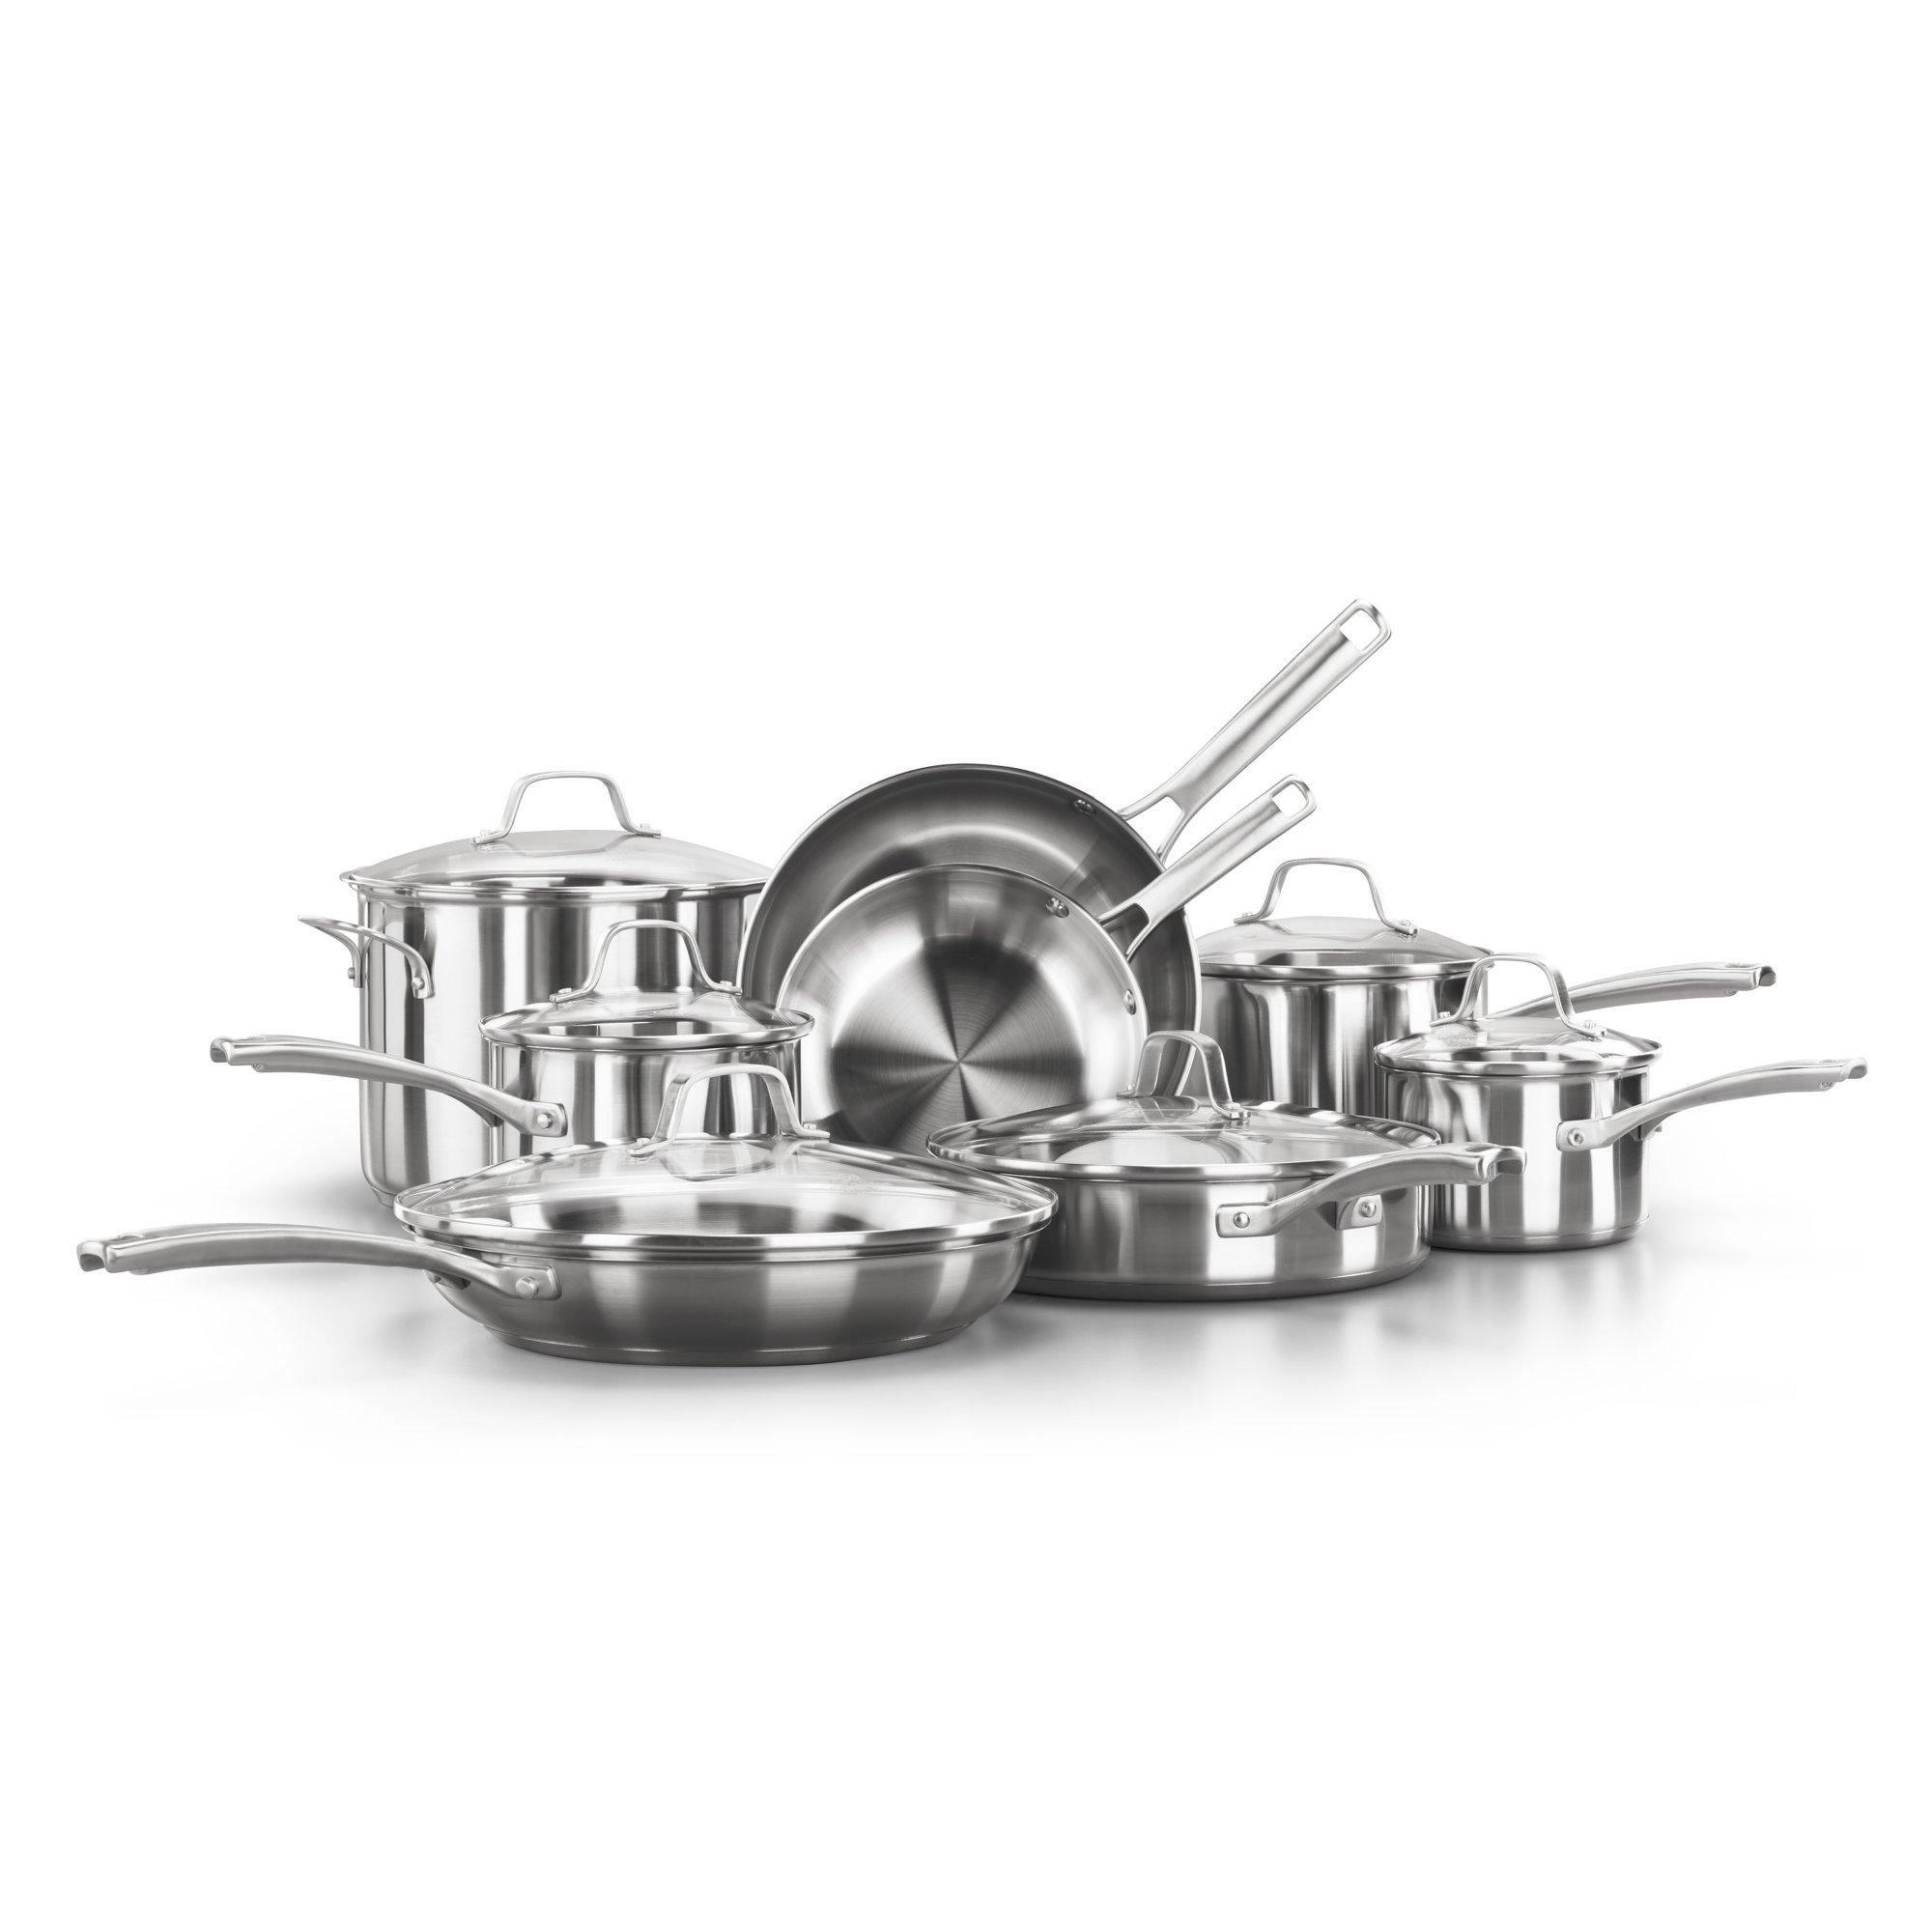 Calphalon Classic? Stainless Steel 14-Piece Cookware Set